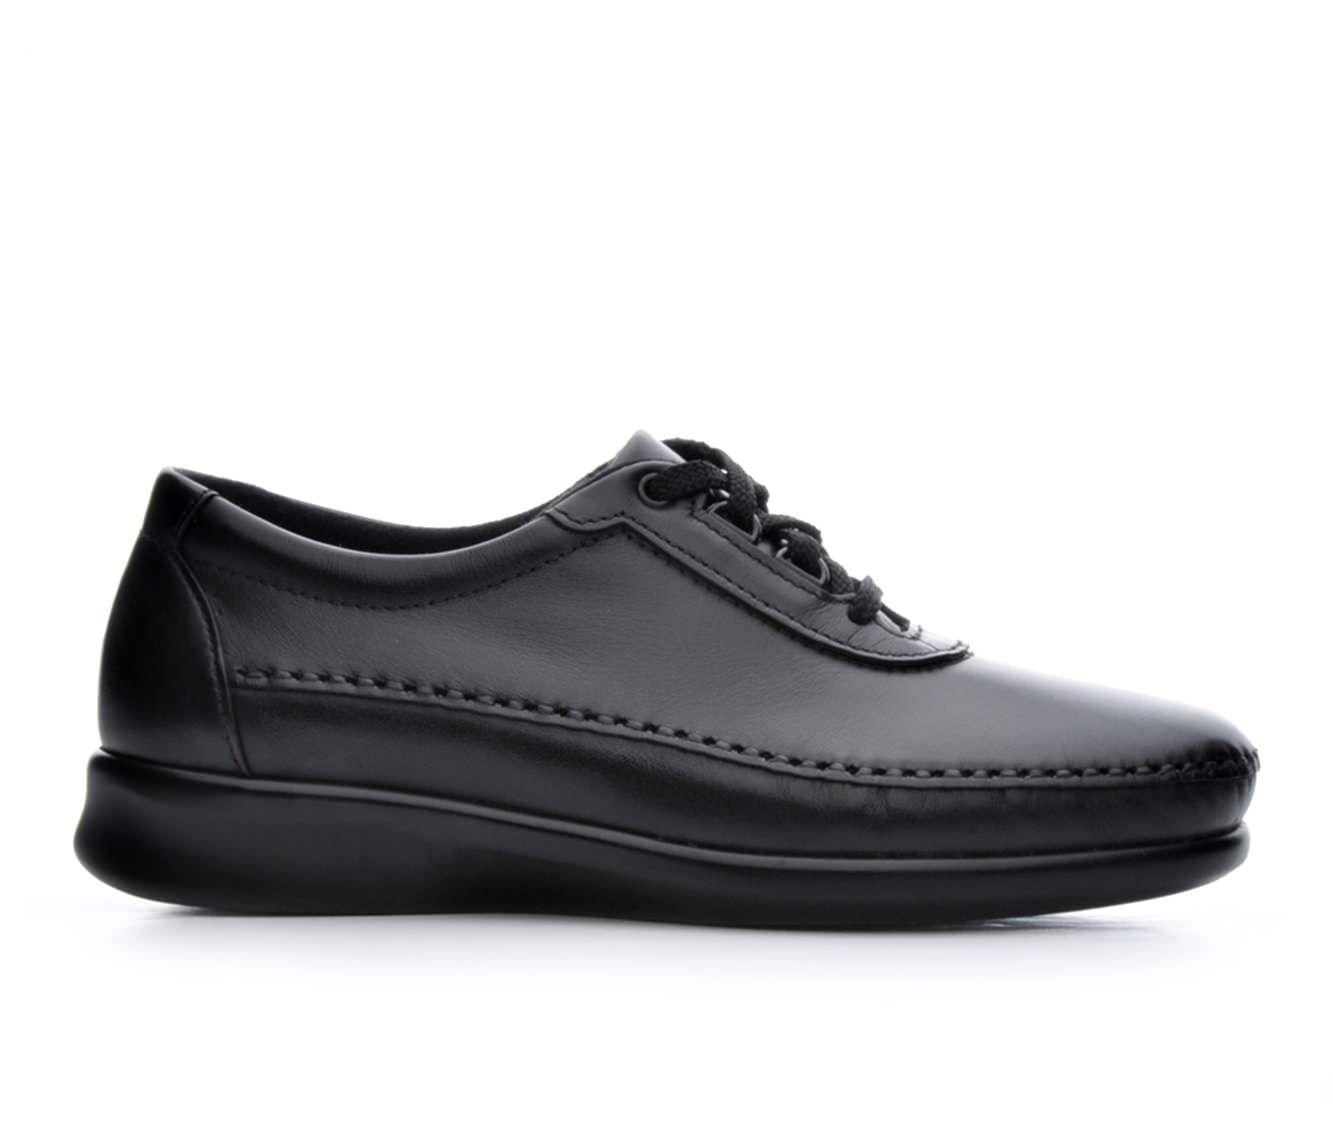 Women's Sas Traveler Comfort Shoes Black